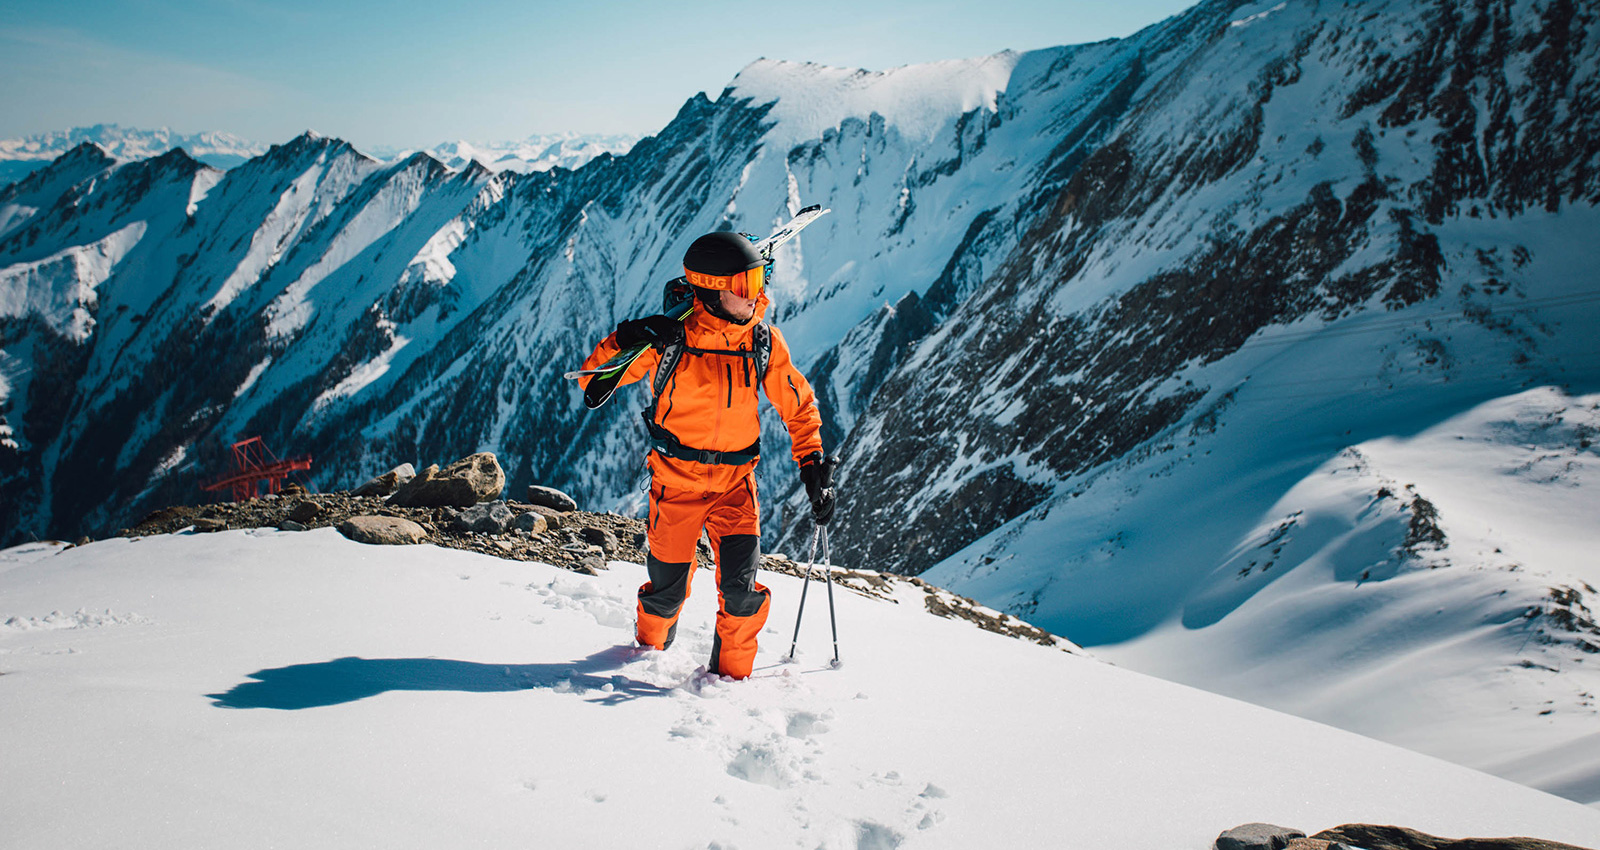 SalzburgerLand Winter 2019